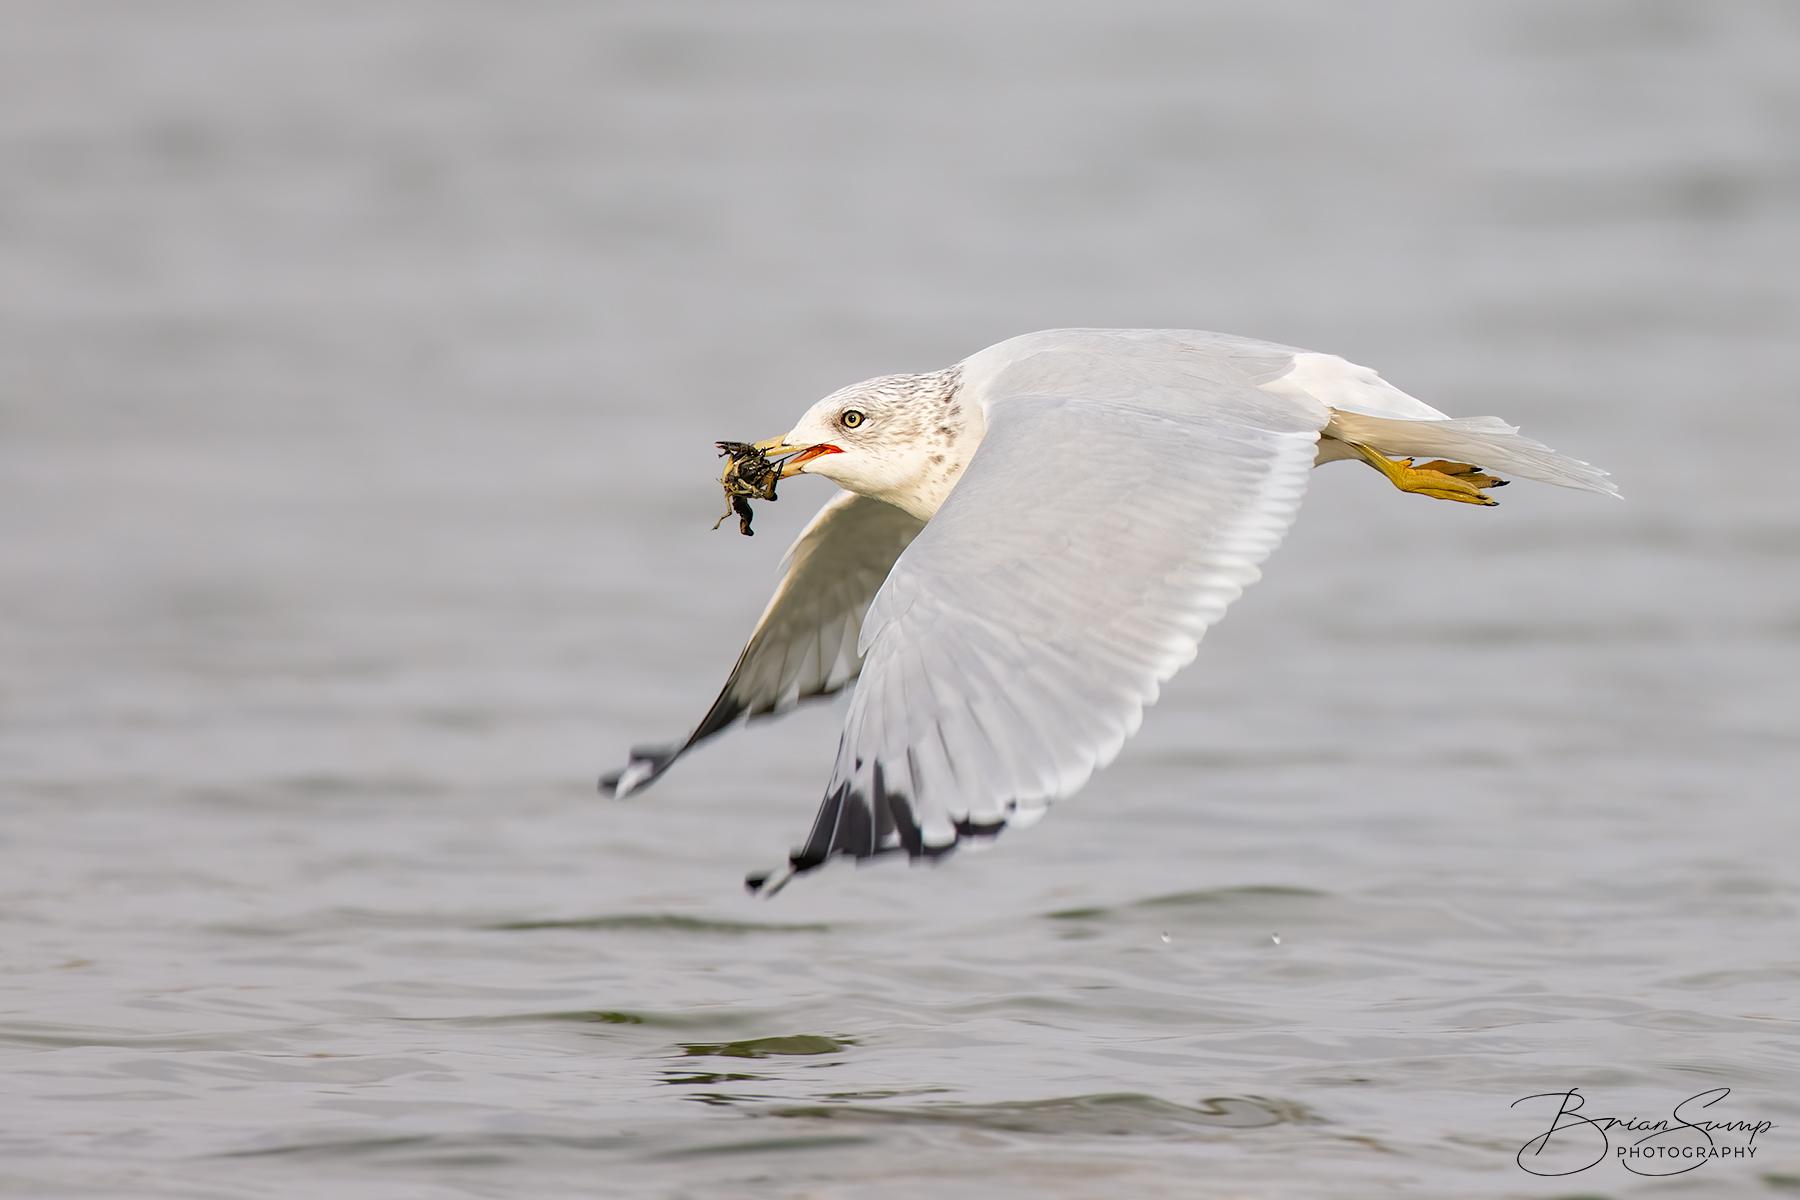 Name:  20201020-Gull-crawdad-wingsdown-Brian-Sump-BMS_9533-2-FORUM-SIG-USM170-touch-craw.jpg Views: 152 Size:  518.7 KB